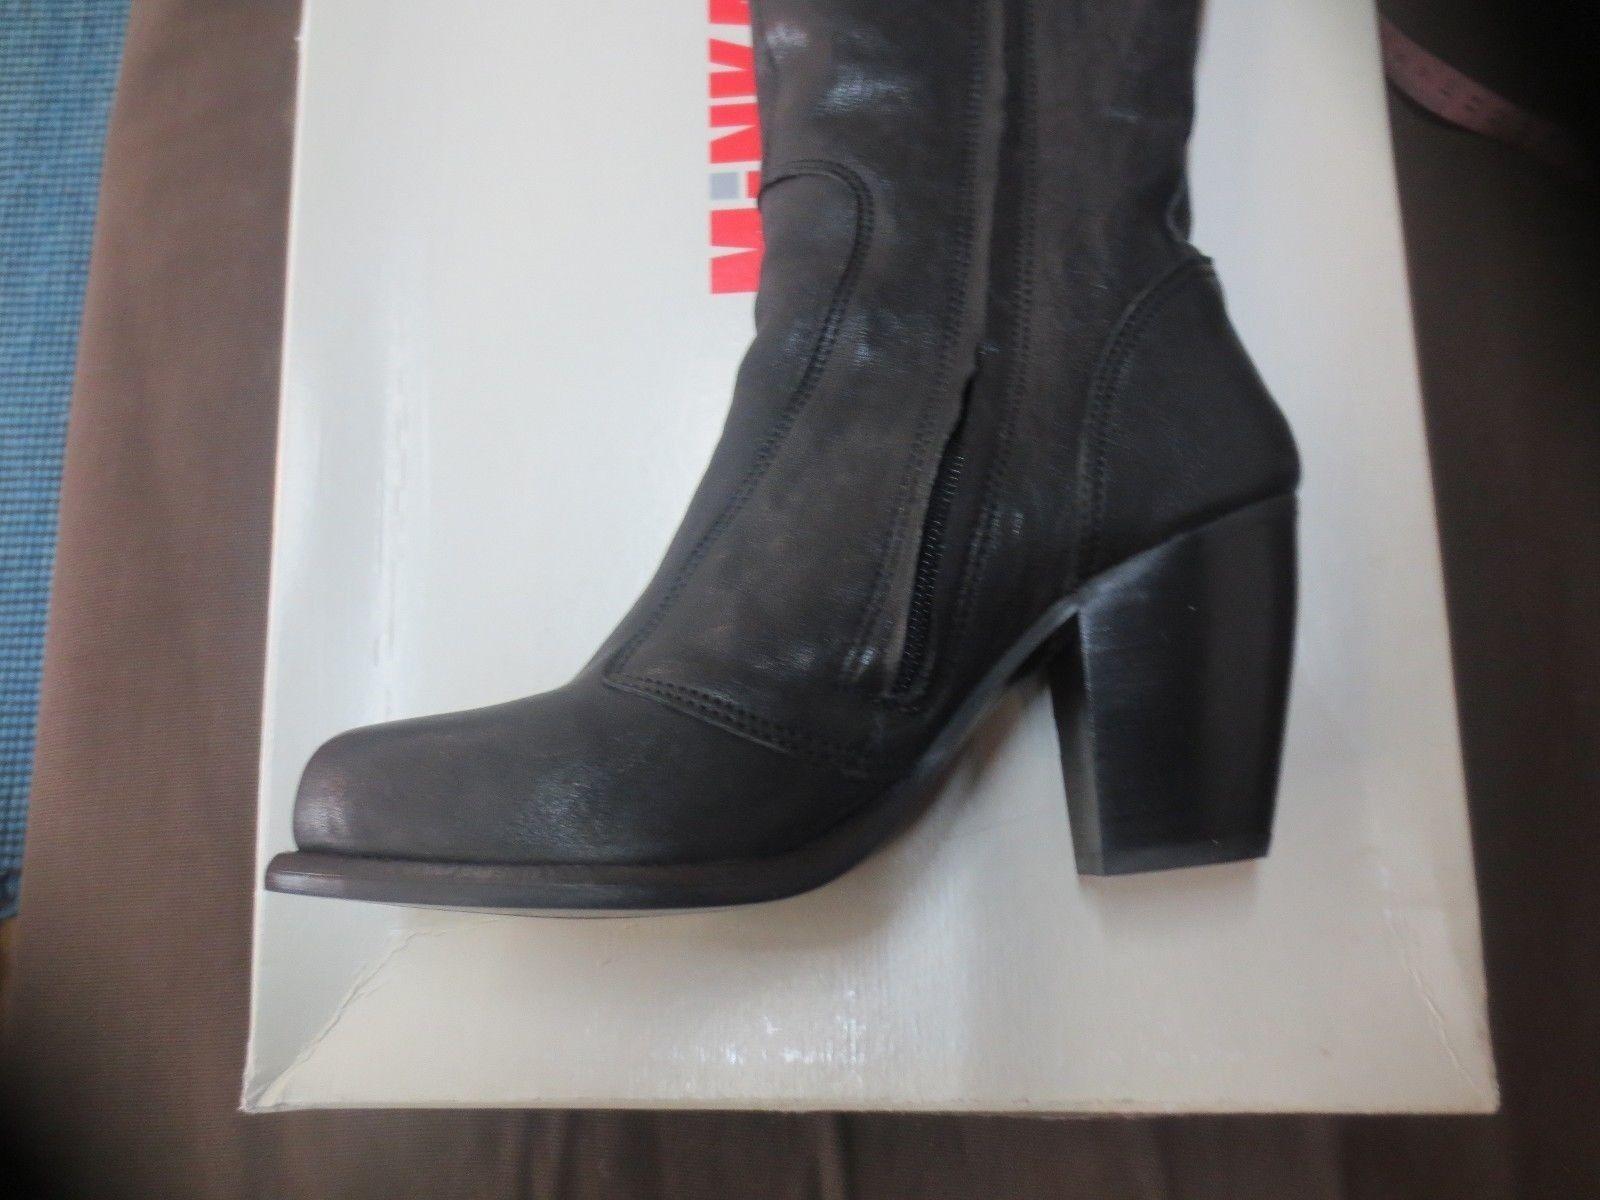 MINKA MINKA MINKA design botte cuir black NEUVE valeur 179E talon 8cm pointures 37,40 d15b7a